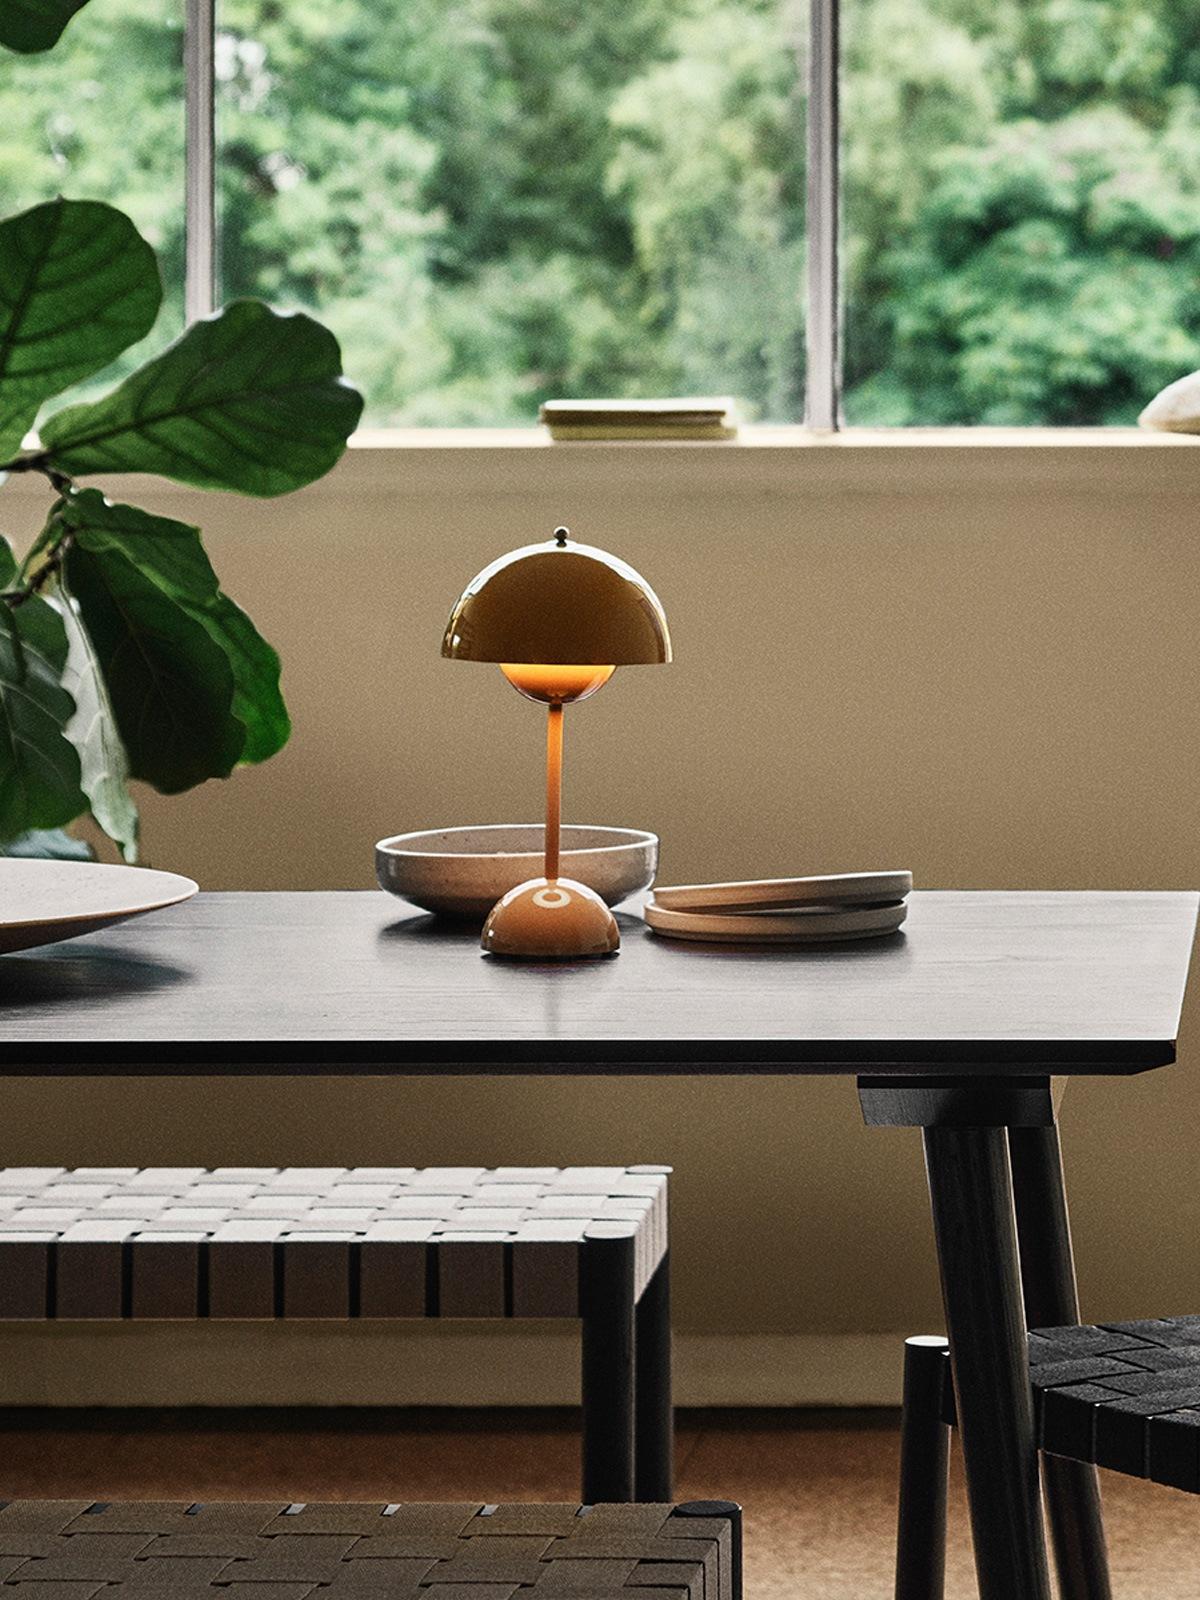 tragbare Akkuleuchte Flowerpot VP9 6tradition DesignOrt Lampen Berlin